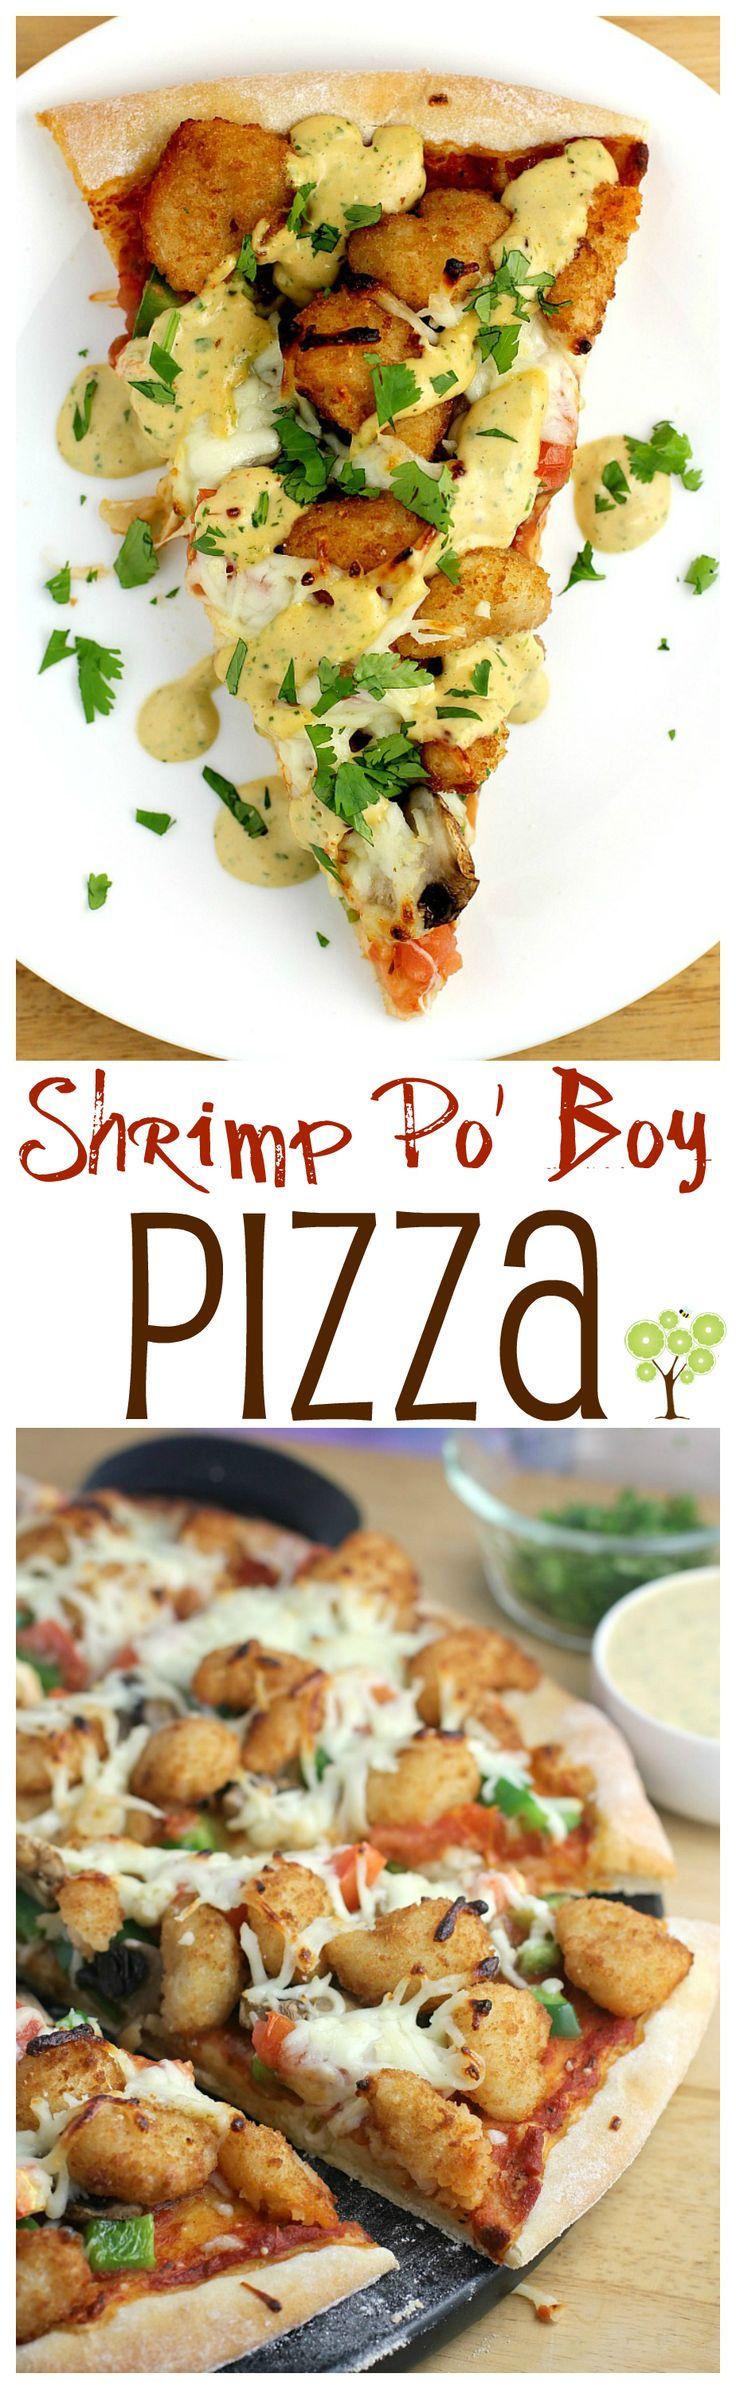 Shrimp Po' Boy Pizza from EricasRecipes.com #ad #ShrimpItUp